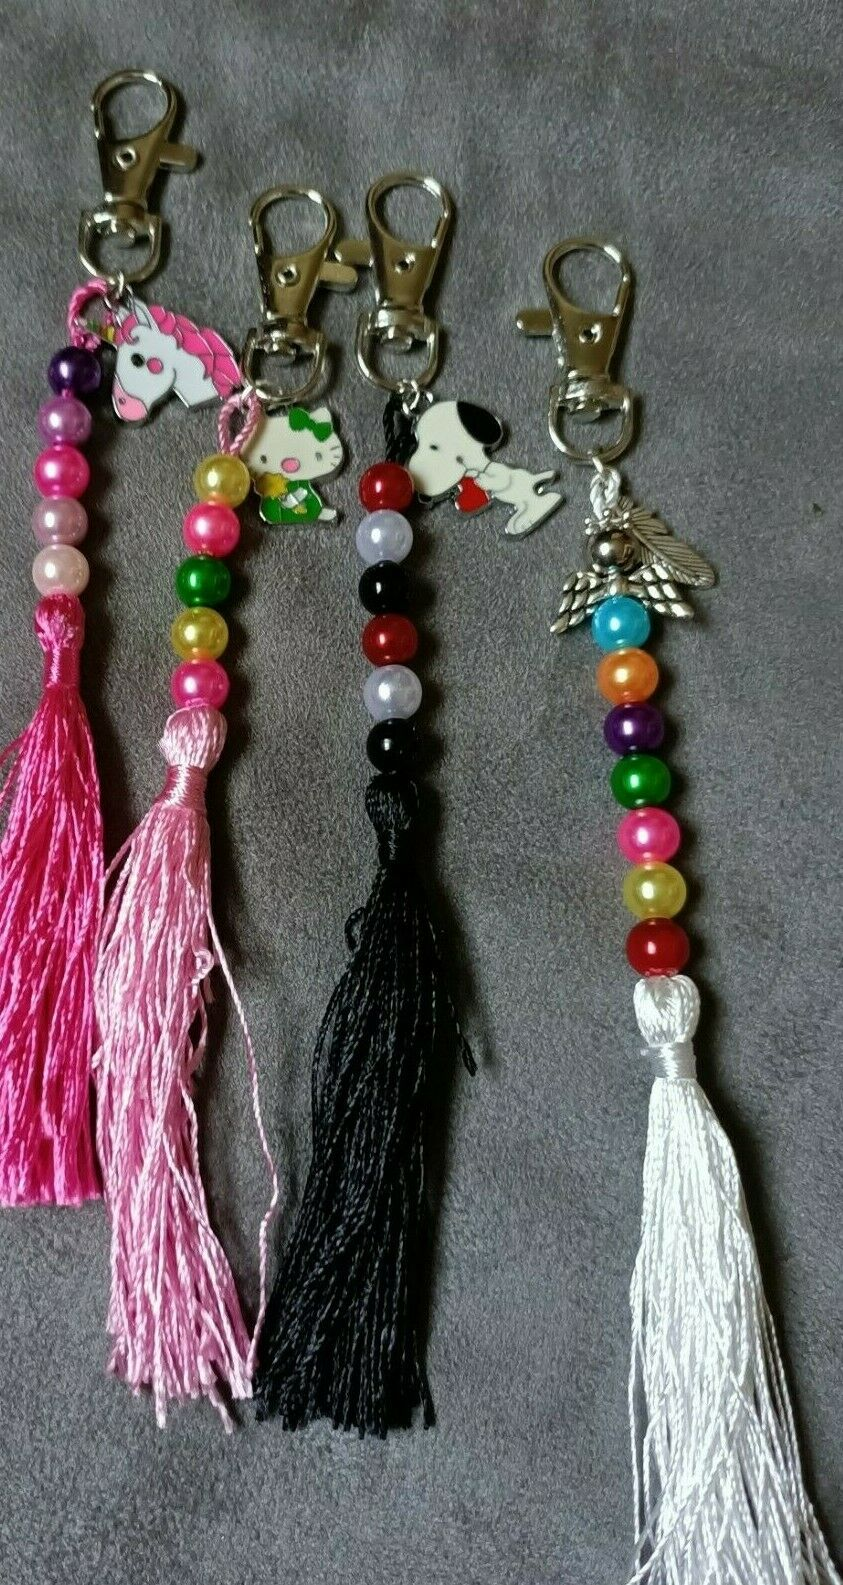 1 x Perles/TASSEL/breloque sac/key charms. Main créé Cadeau. Vendeur Britannique